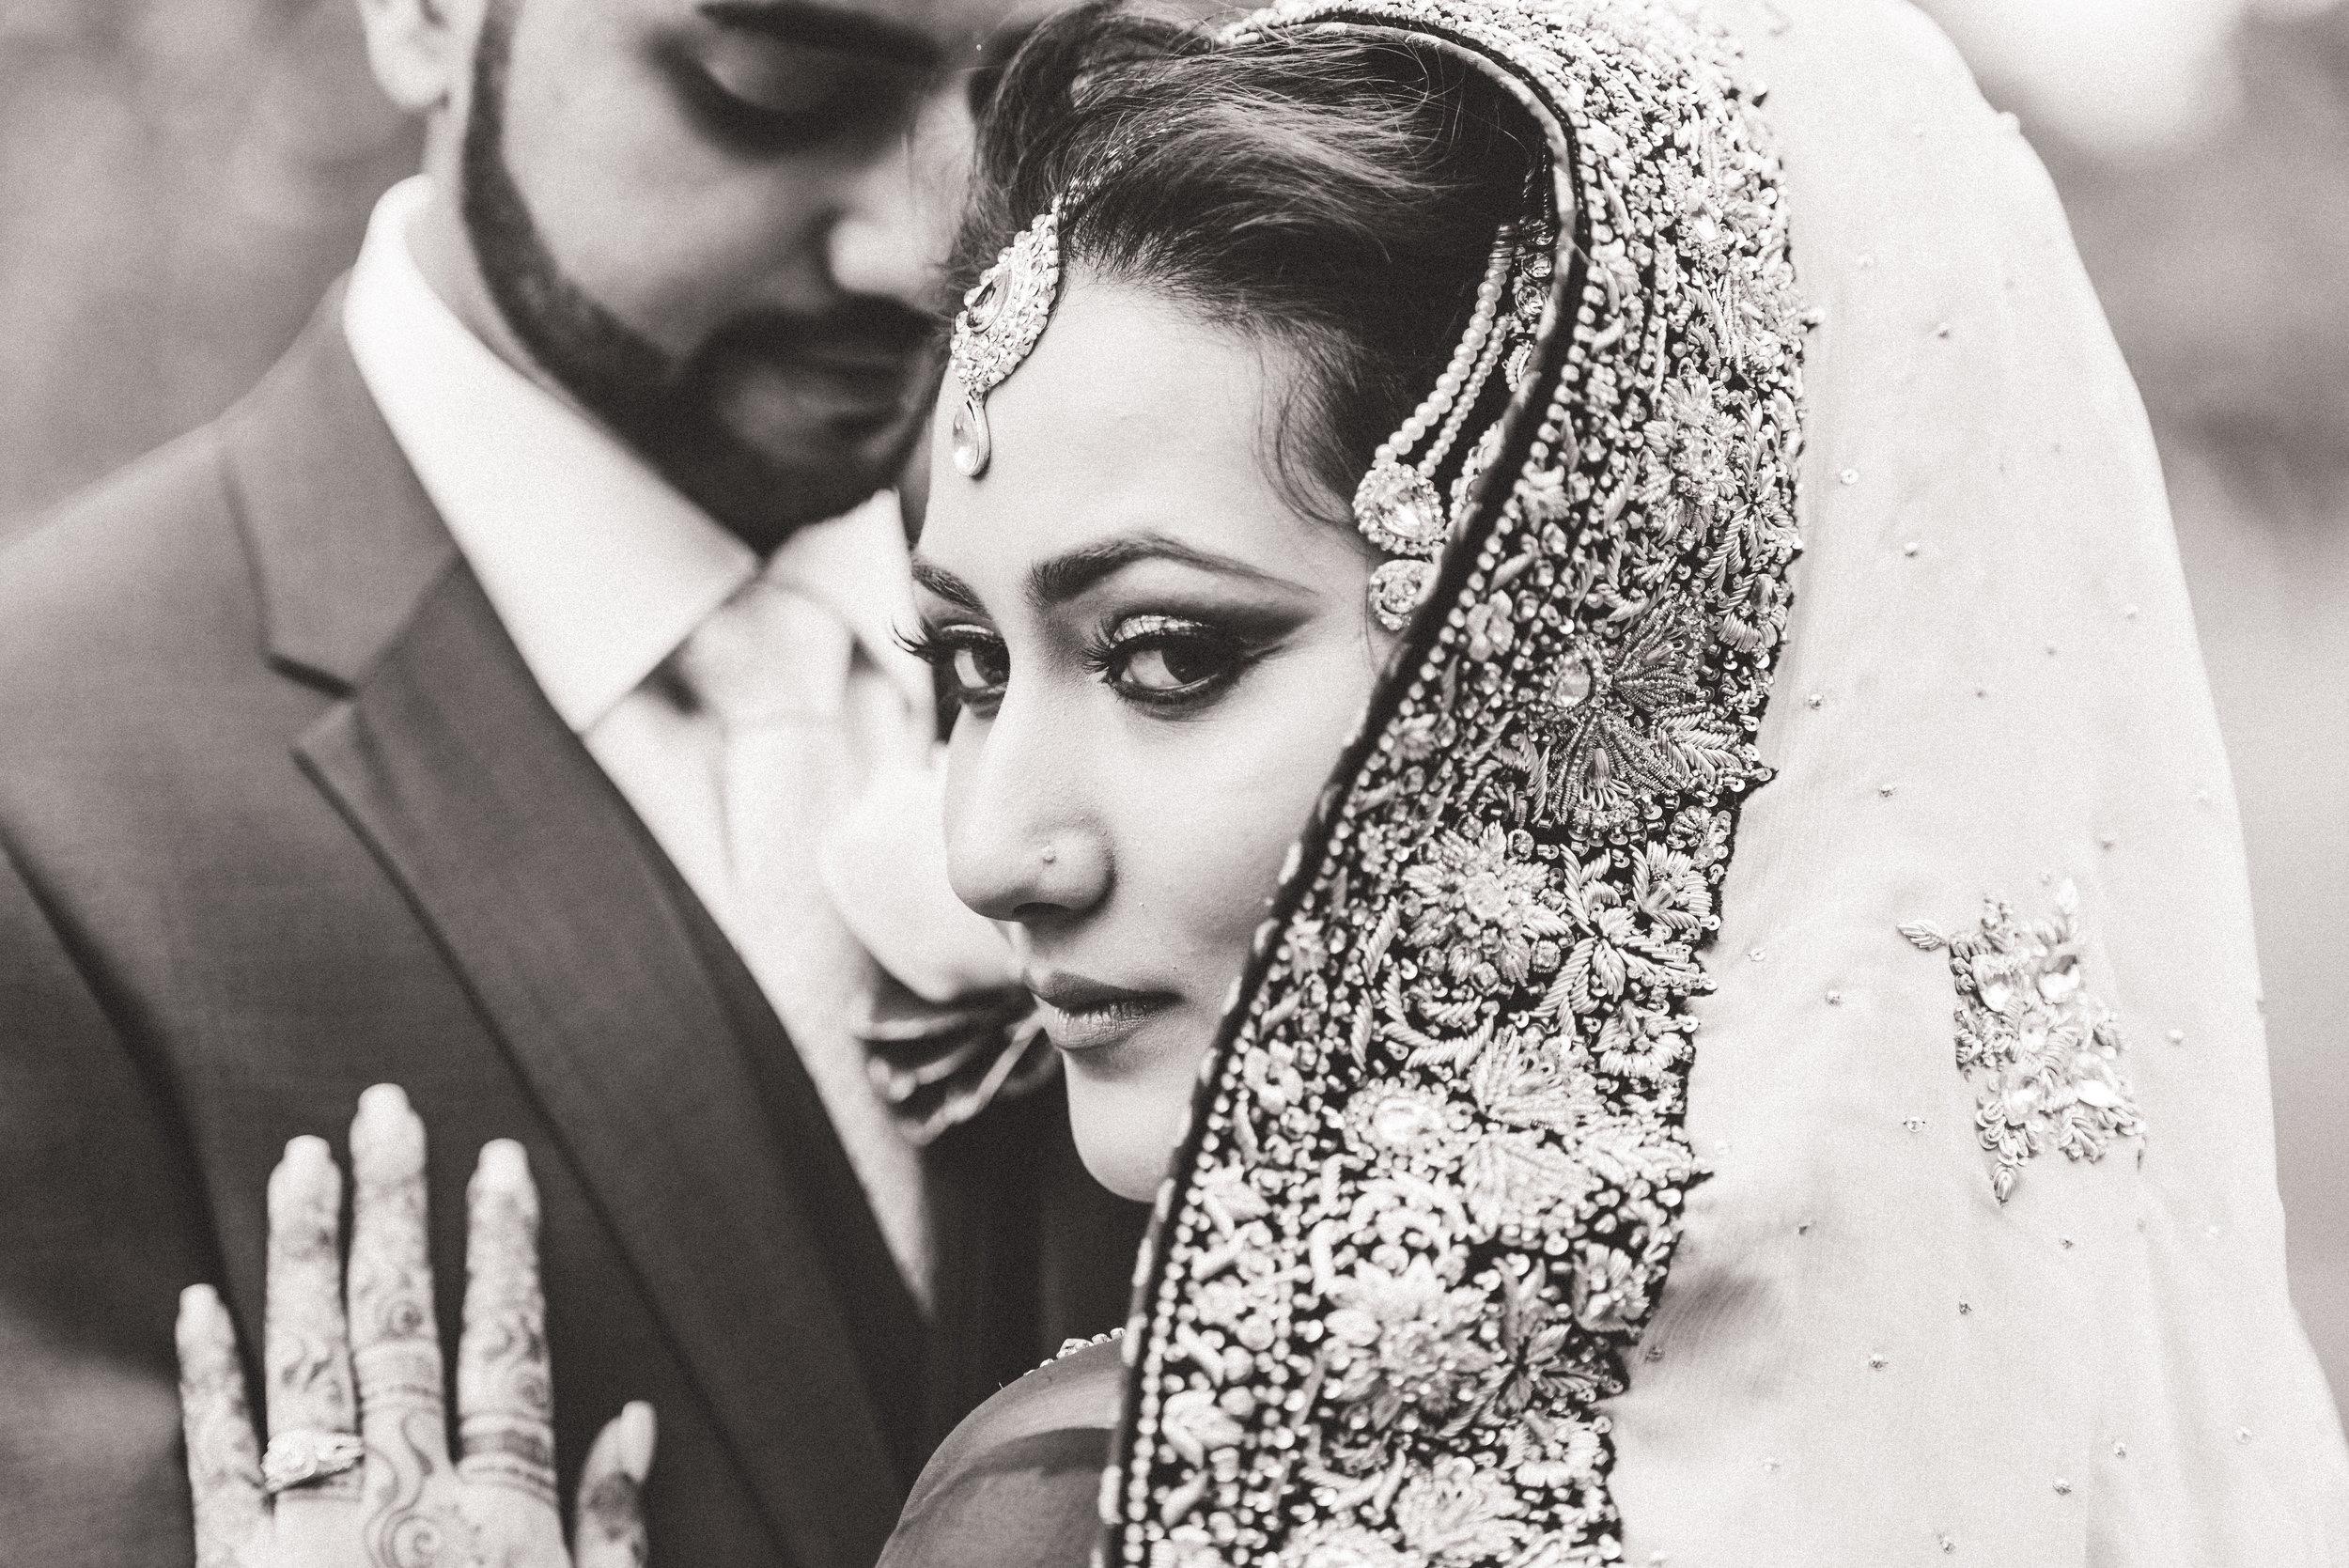 Alina + Mahmood - Ottawa Wedding Photographer Ali and Batoul Photography_-3.jpg